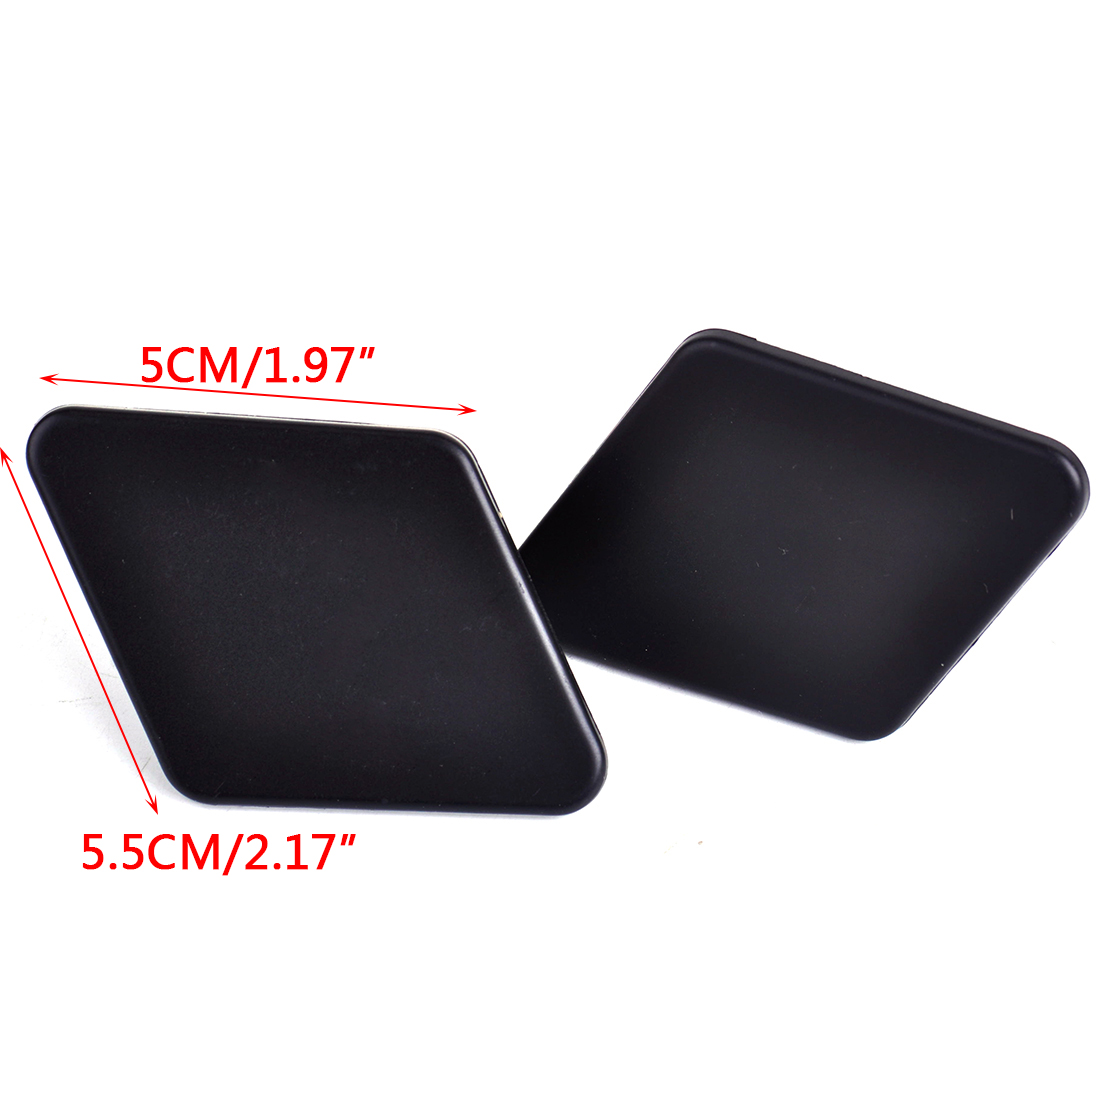 2pcs bumper headlight washer nozzle cover cap fit for bmw. Black Bedroom Furniture Sets. Home Design Ideas